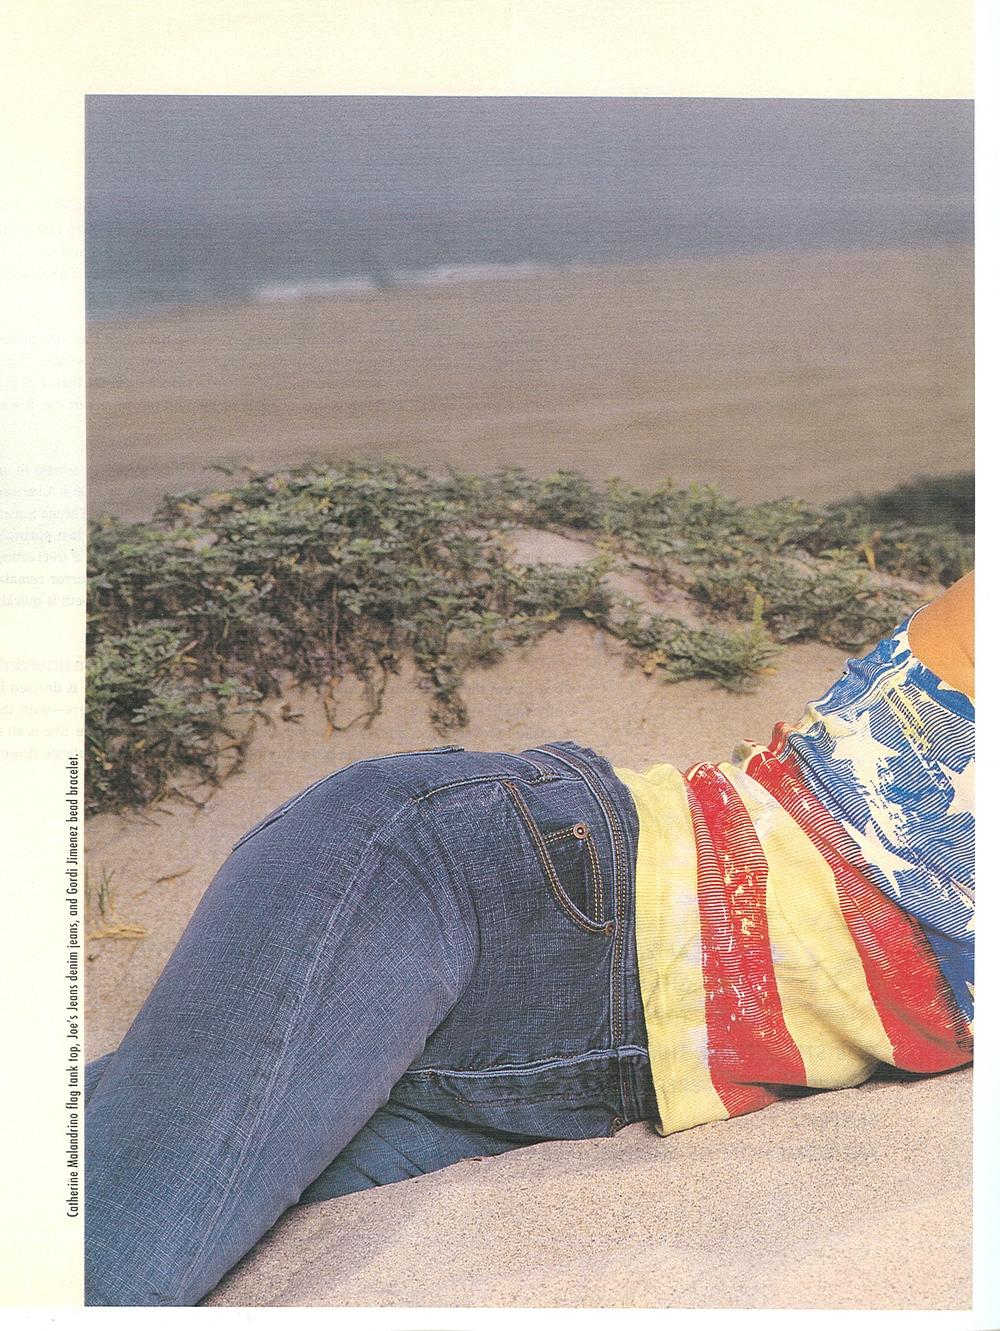 SE_Hamptons Magazine_2001_5.jpg